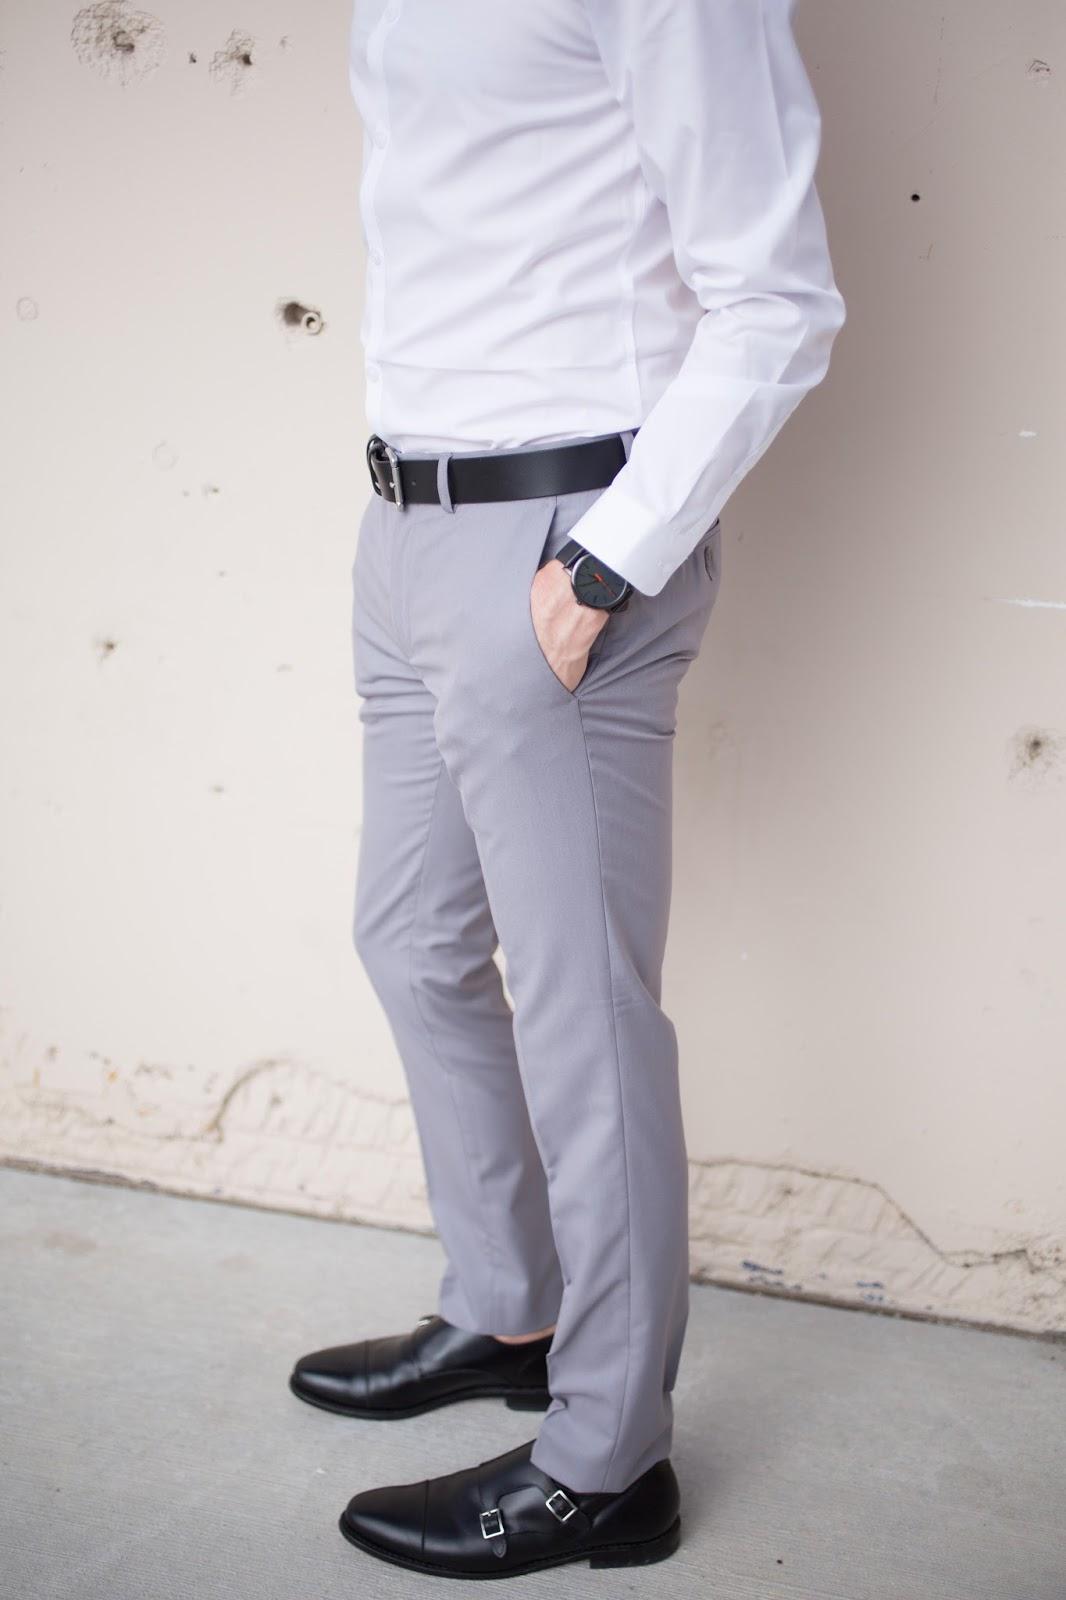 allen edmonds double monk mora 2.0 topman menswear mens style fashion